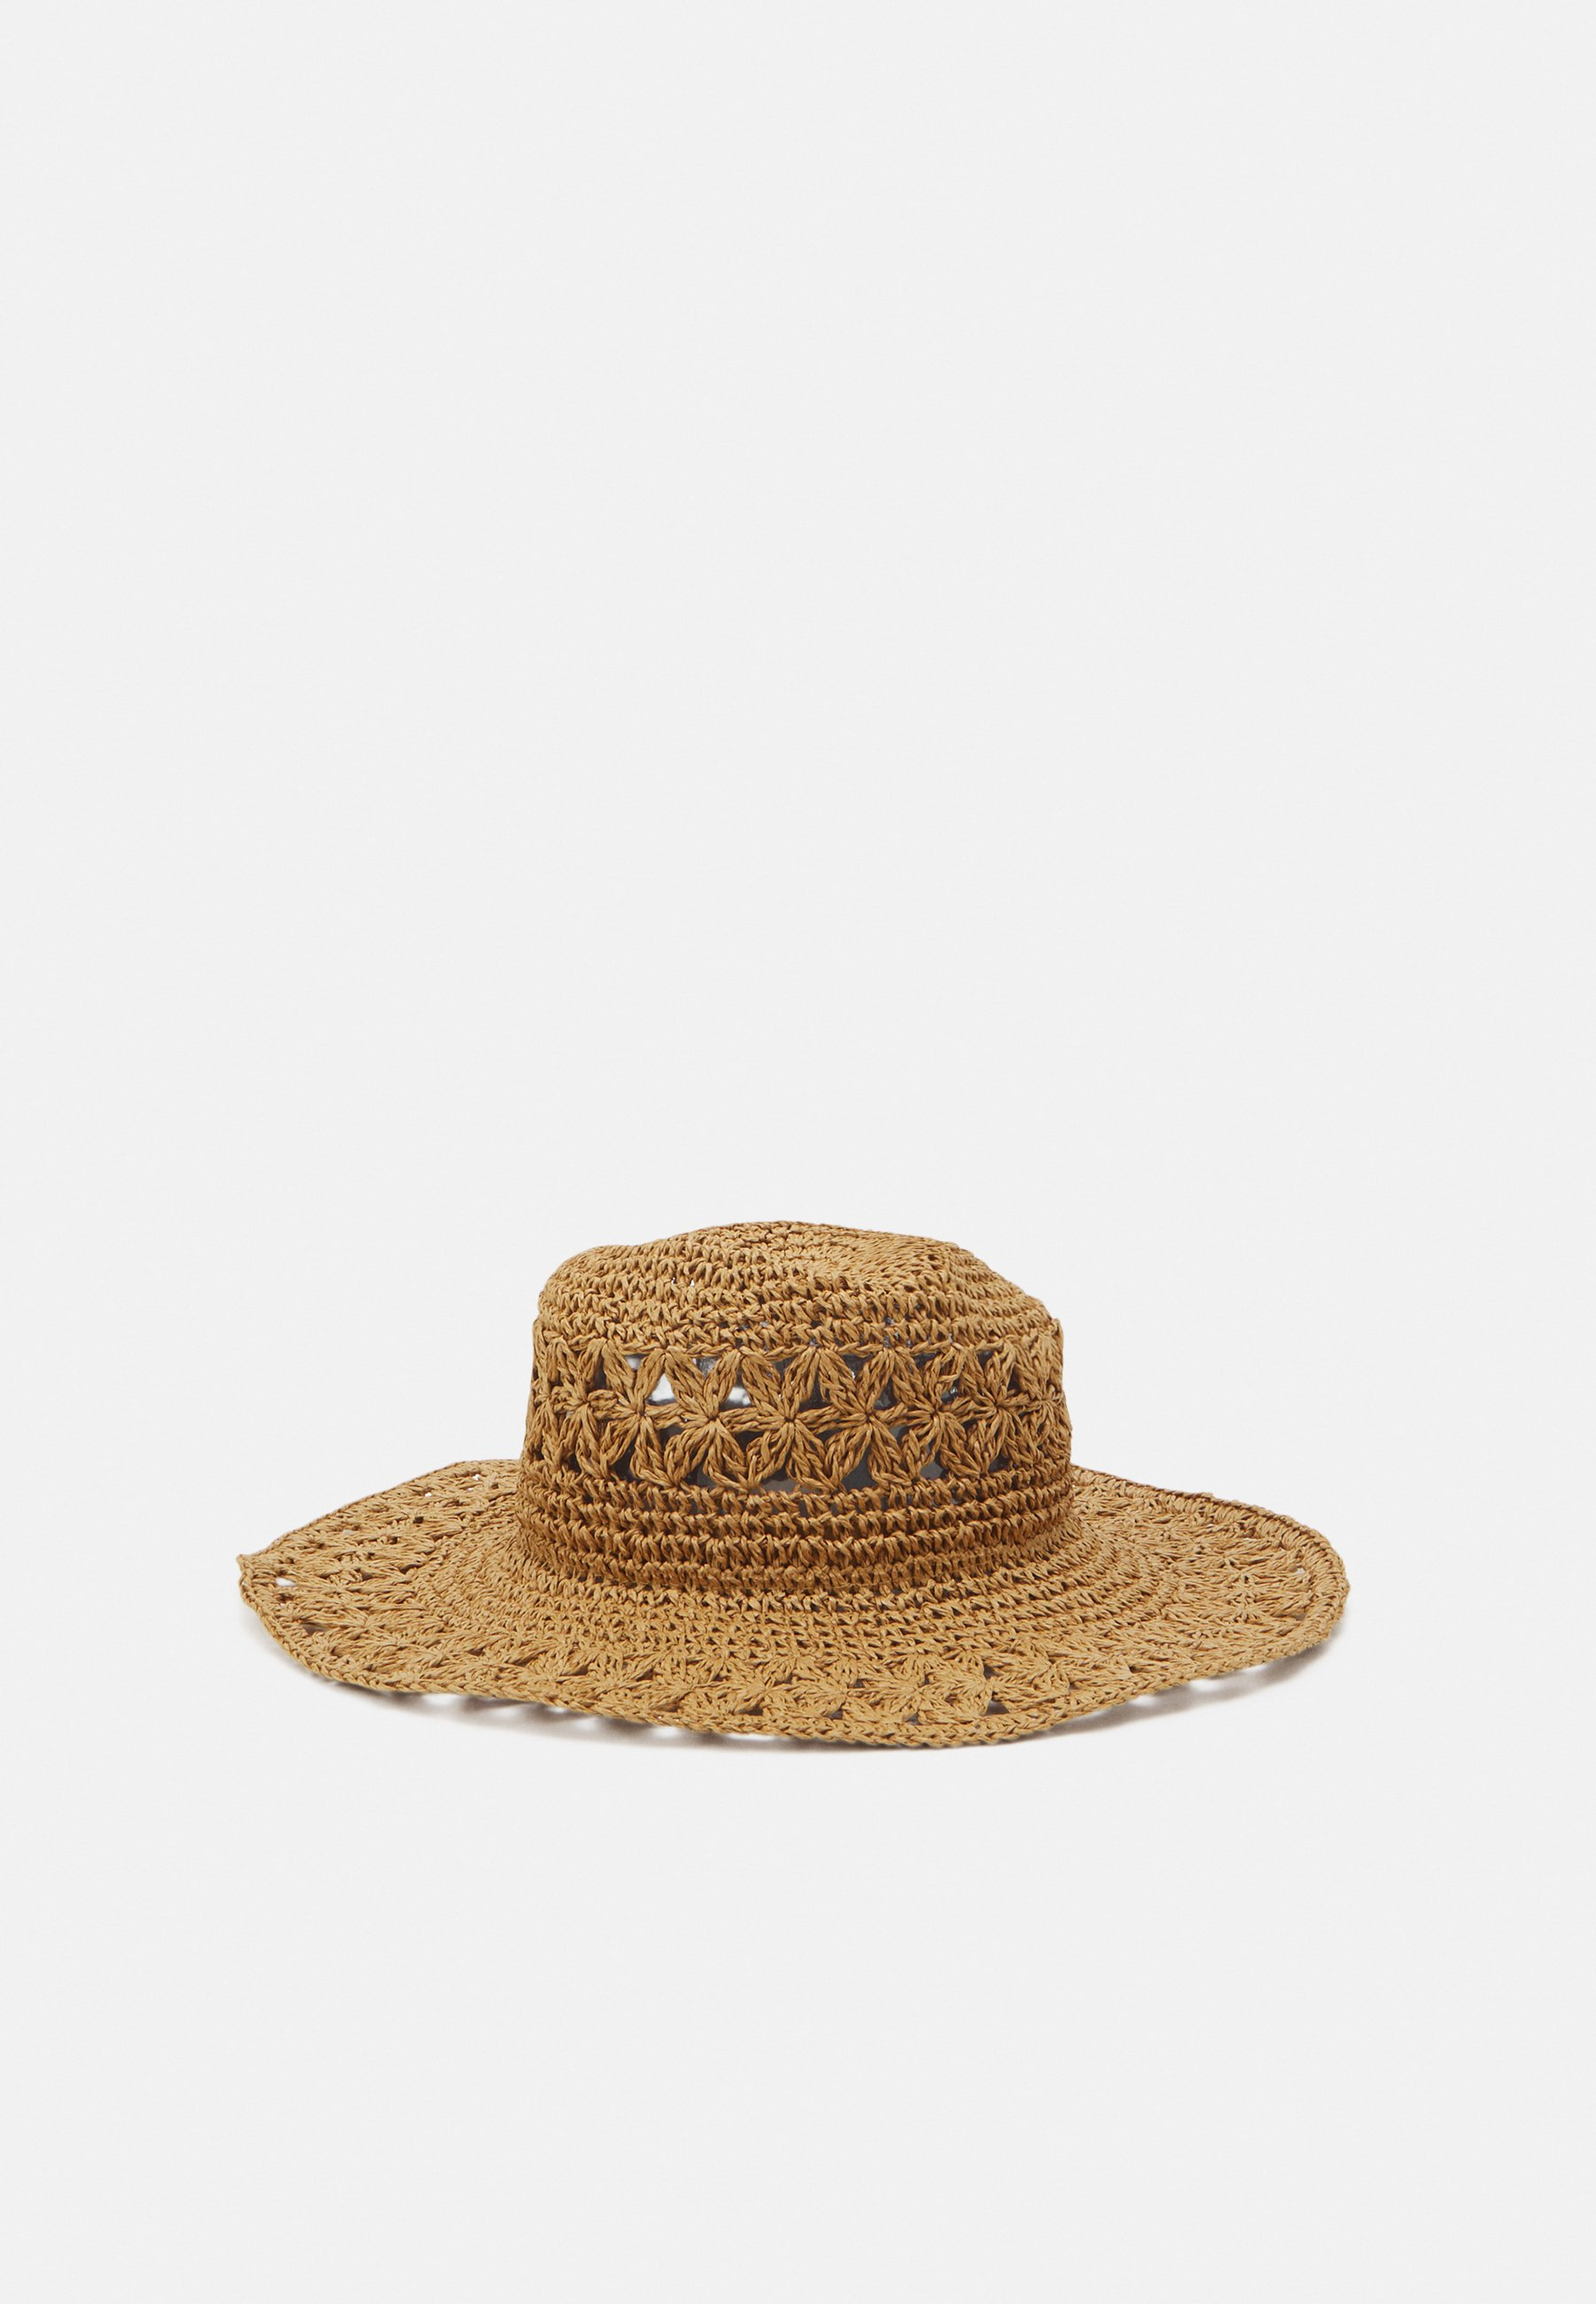 Damer SHADY LADY DAISY CHAIN HAT - Strand accessories